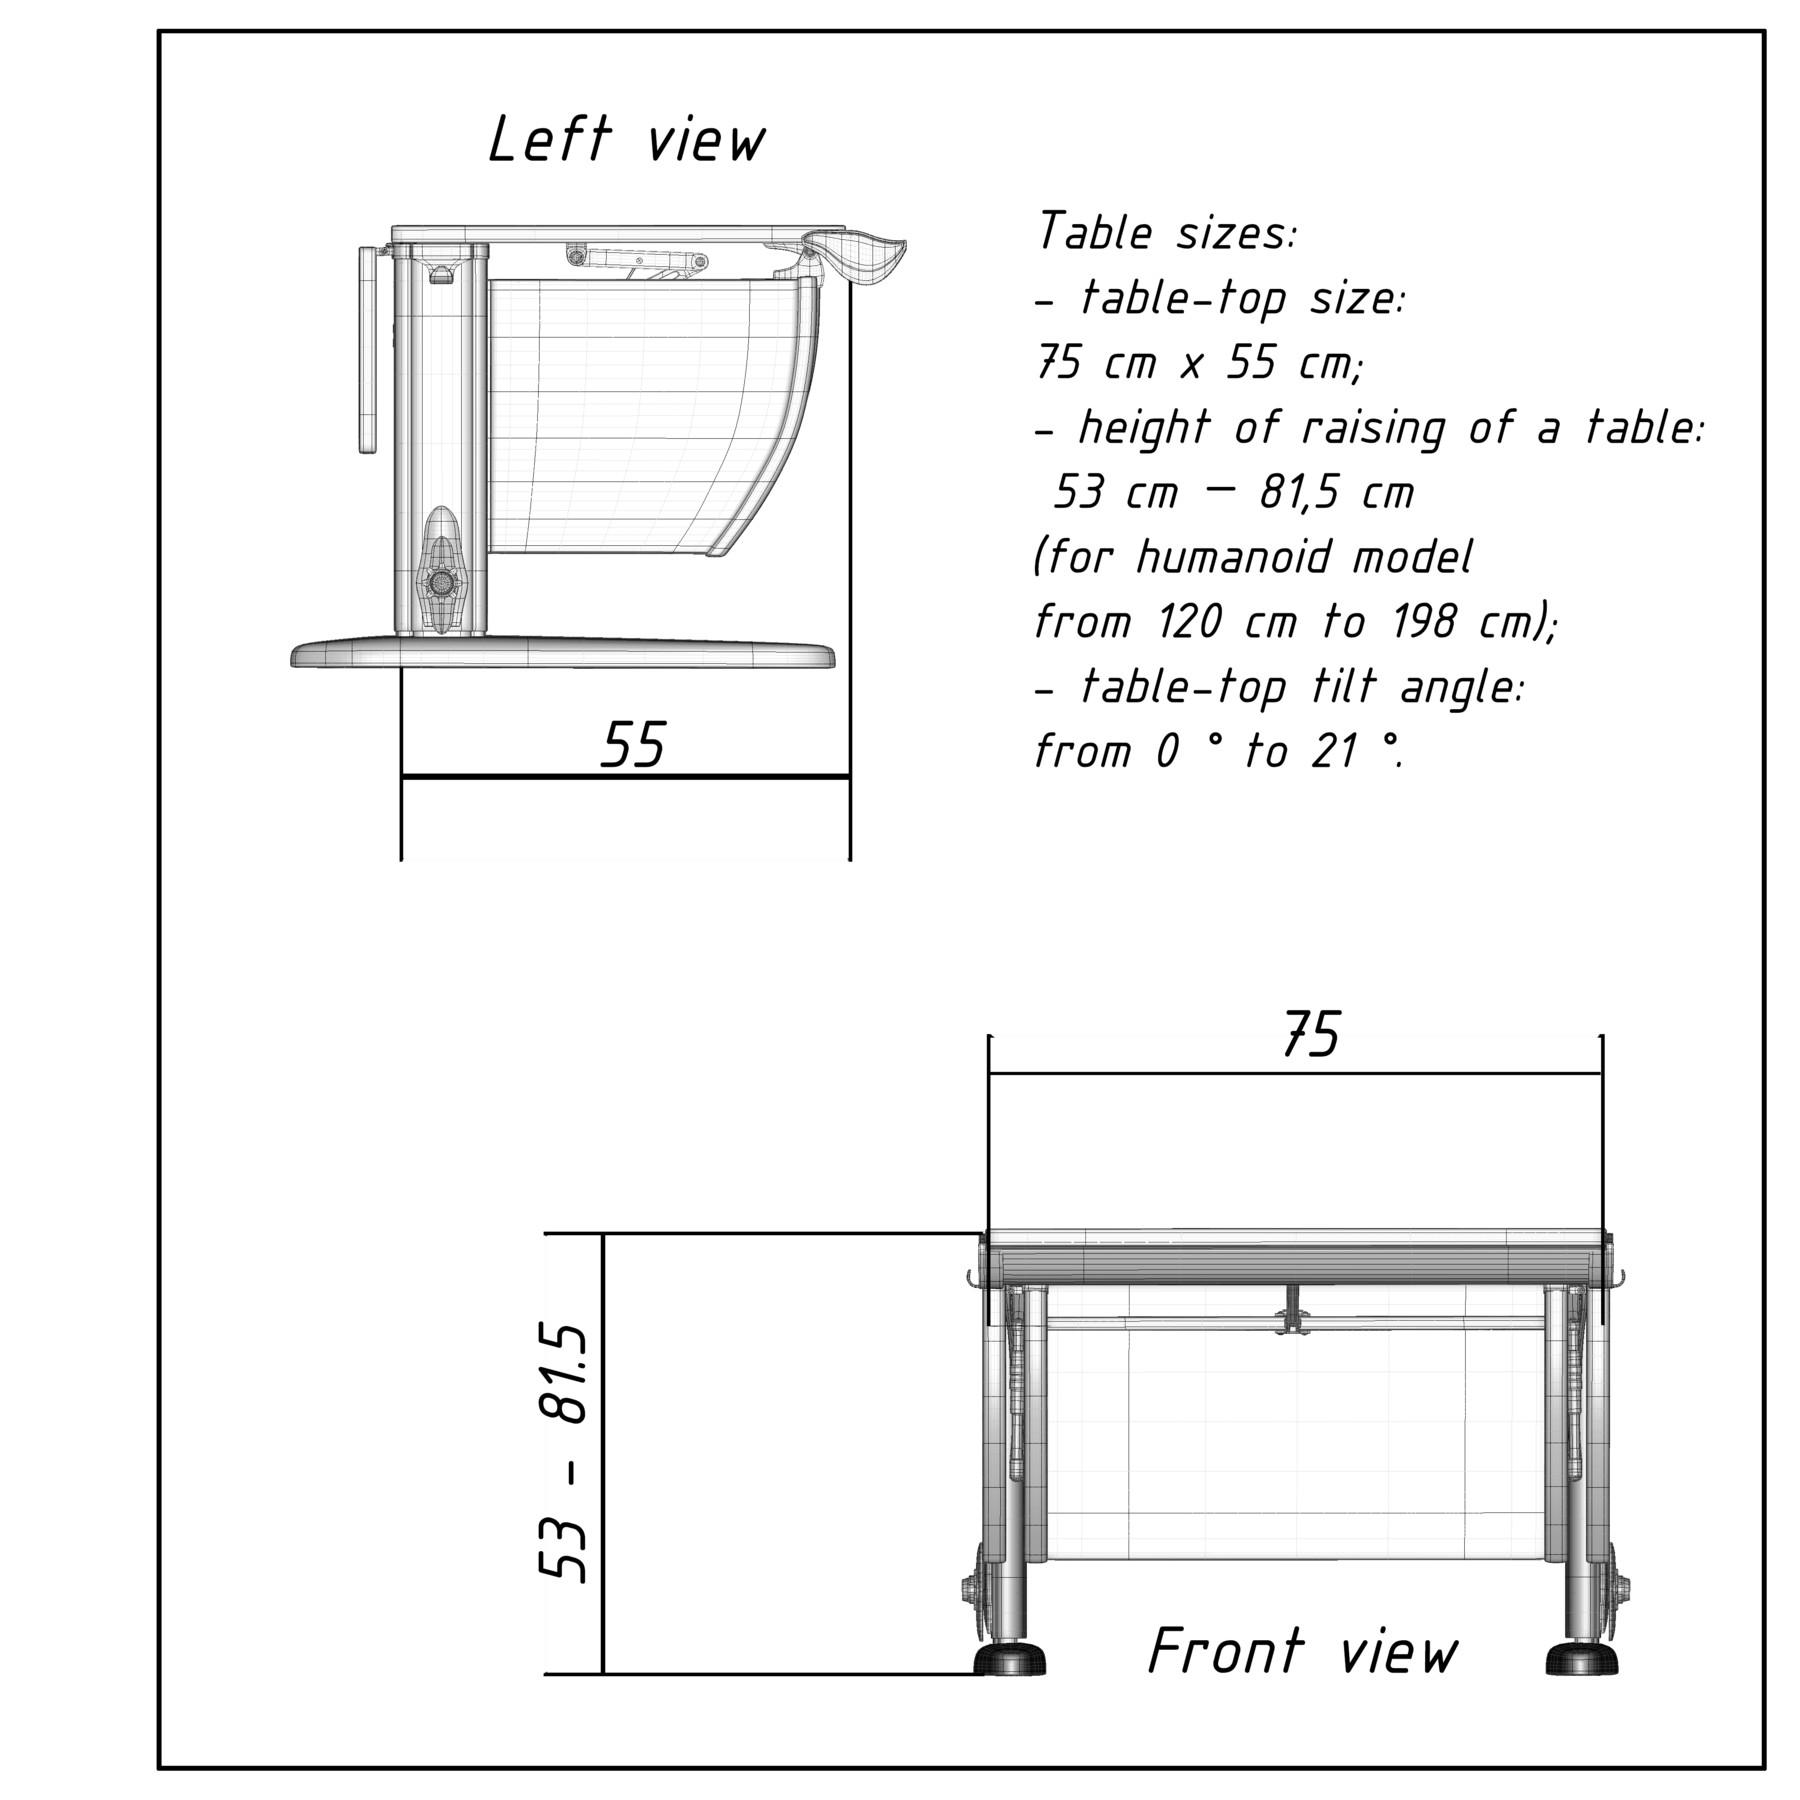 Artstation School Desk Resources, What Is The Size Of A School Desk